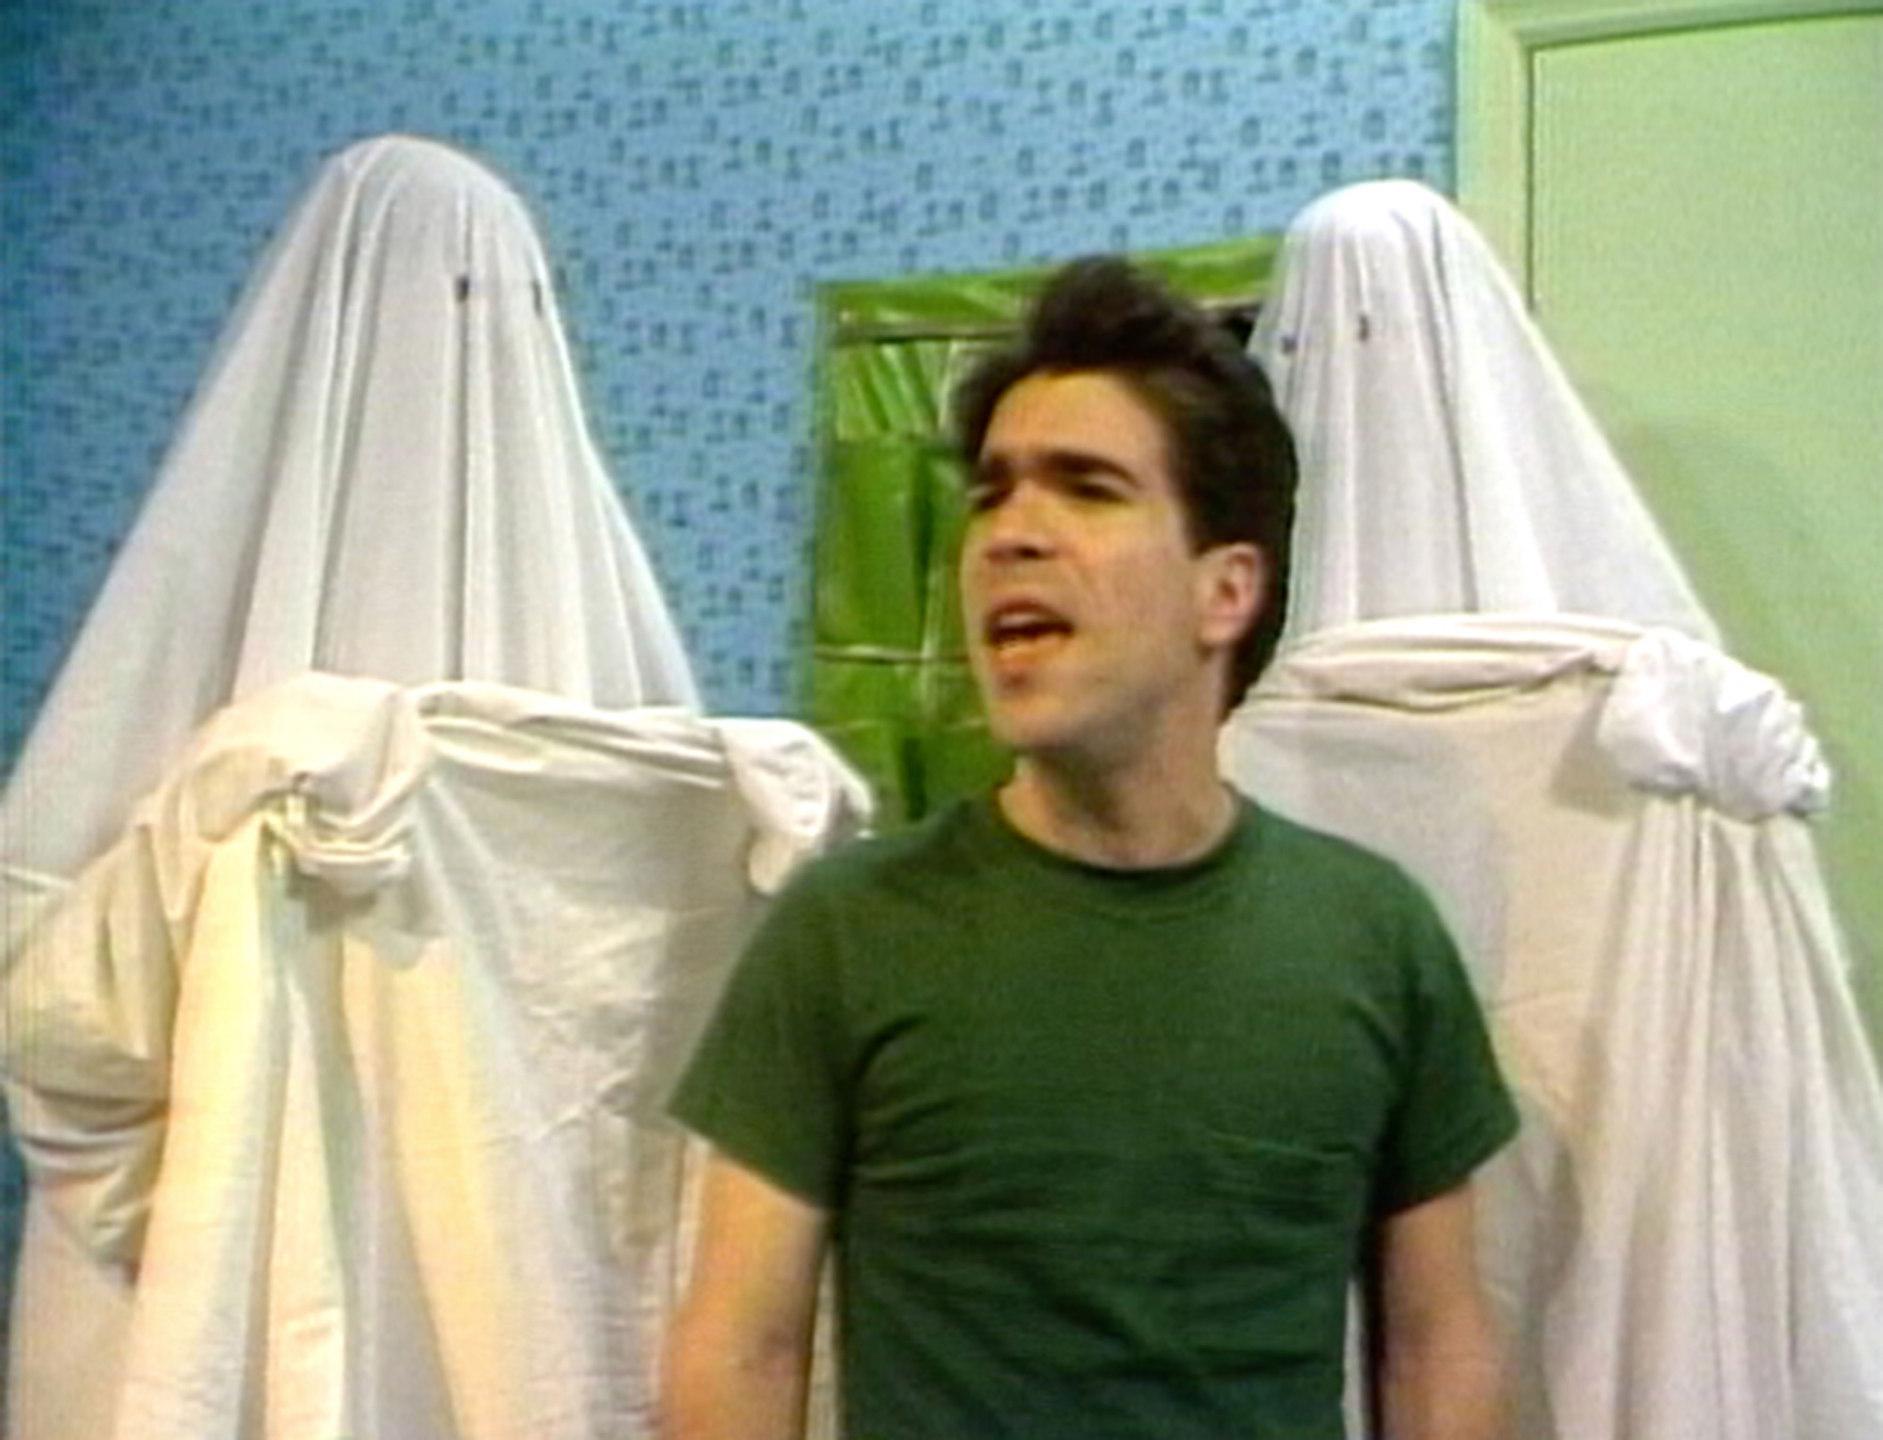 Michael Smith, Secret Horror, still from video, 1980, colour video 4:3, duration 13 mins 24 secs